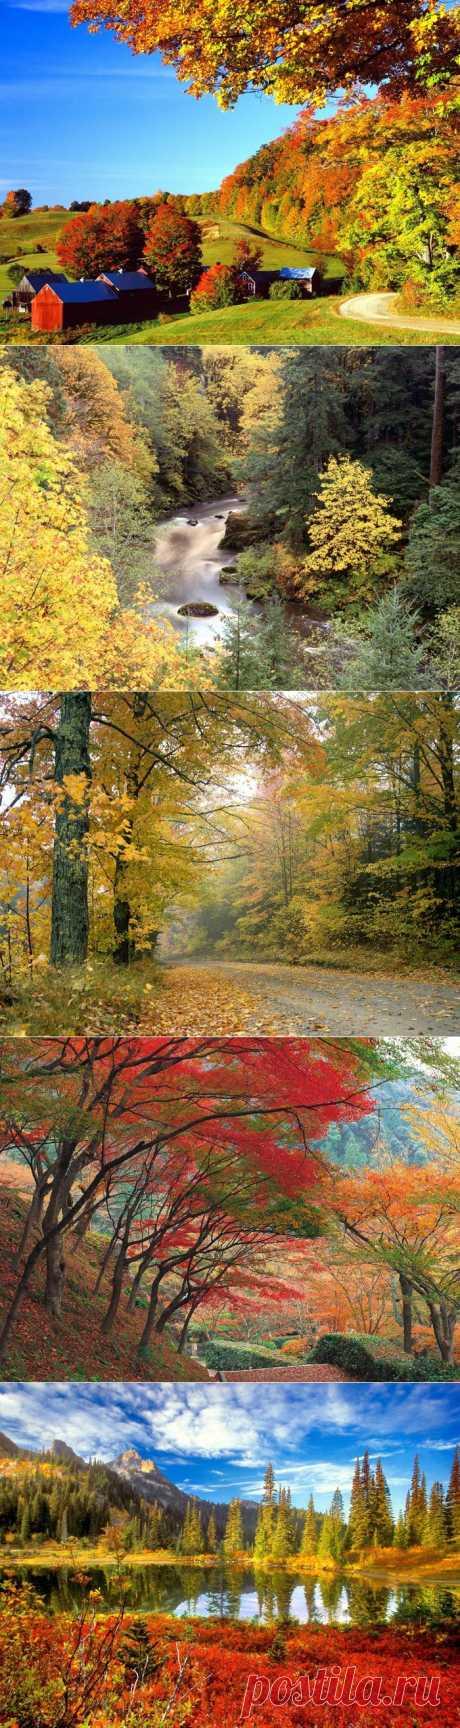 Фото красивой осени для дневника.